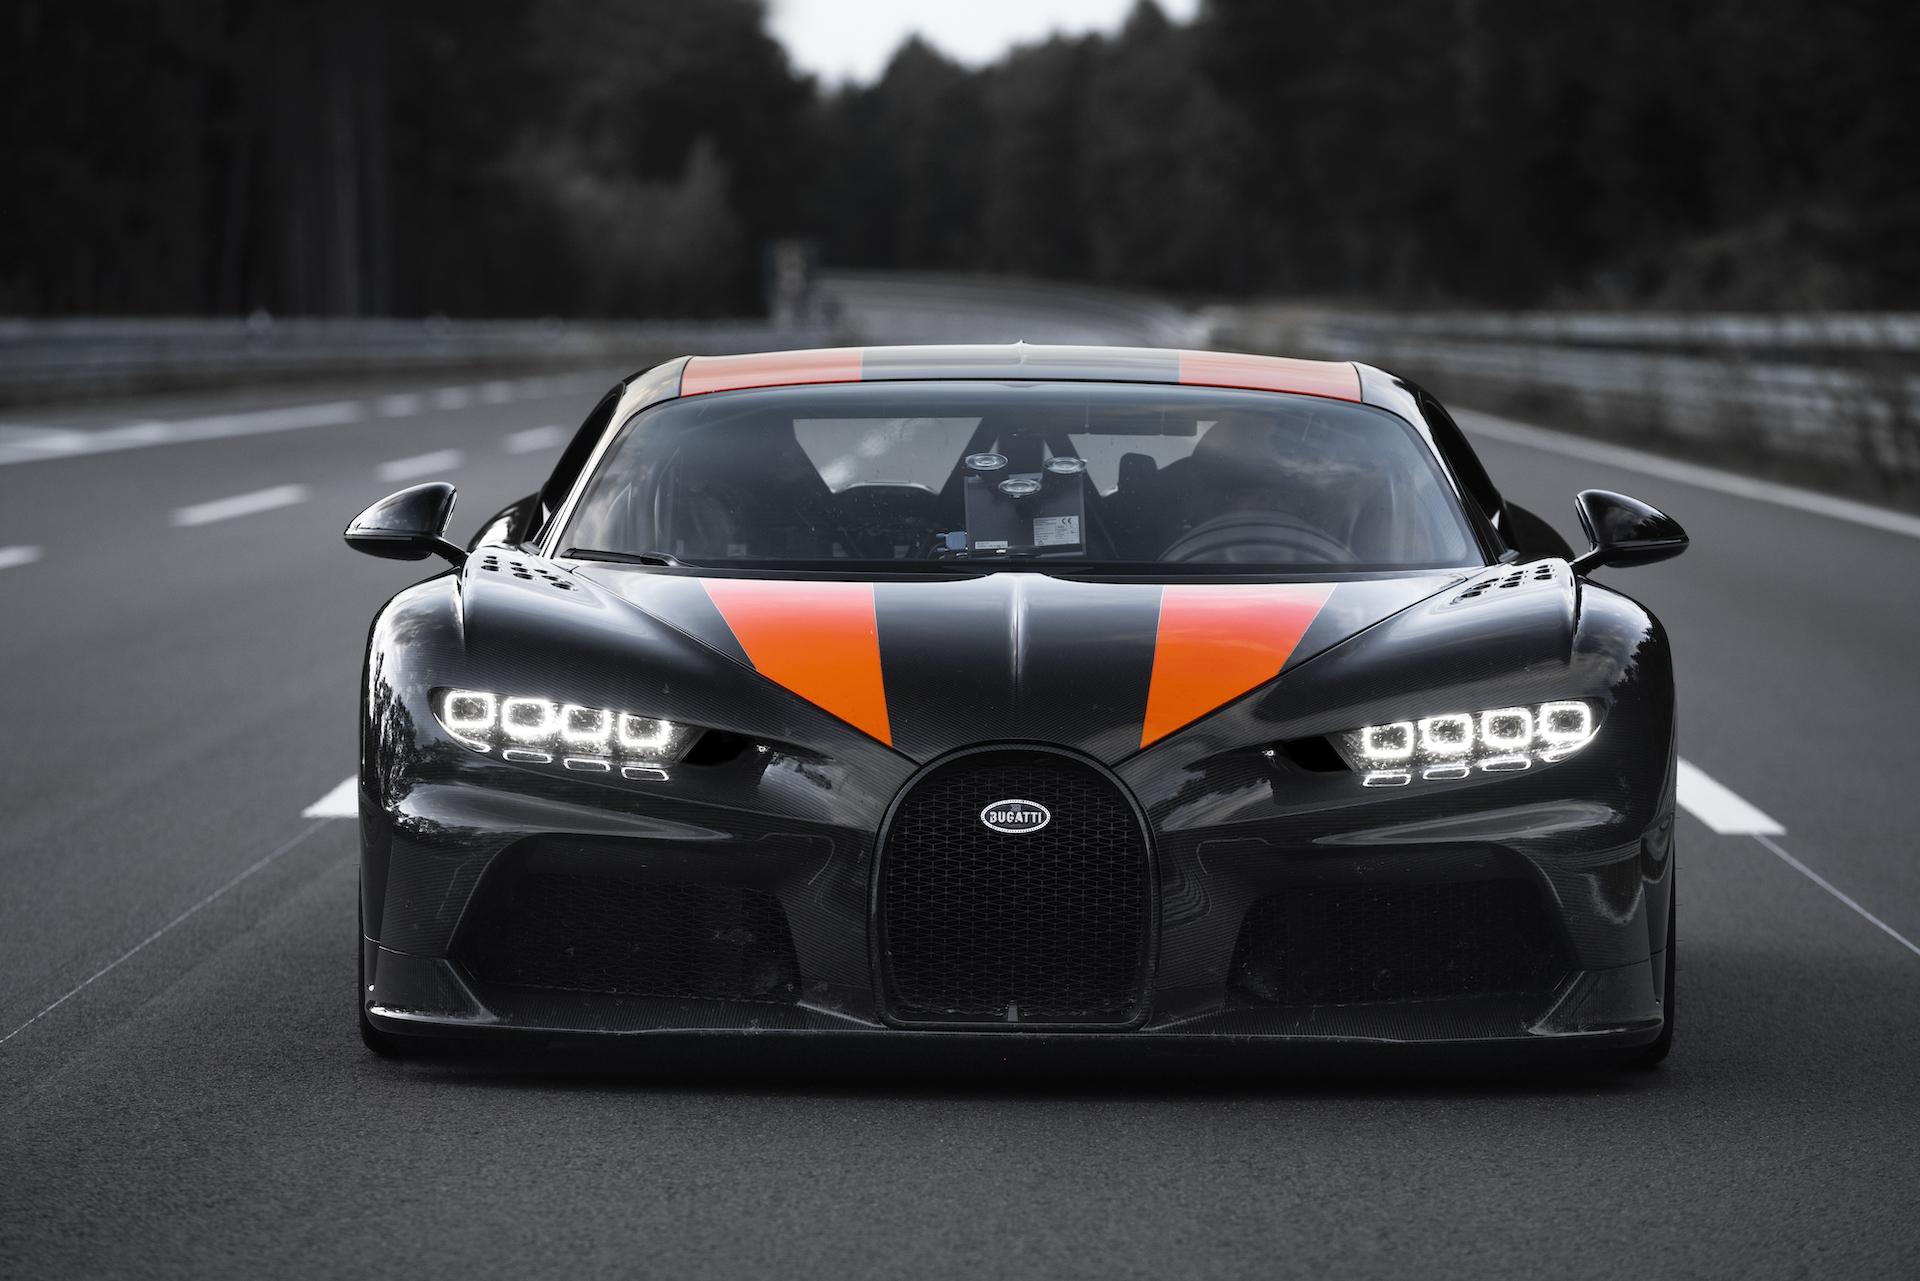 Lamborghini Sian Fast And Furious Cars Bugatti Goes 300 Mph Car News Headlines